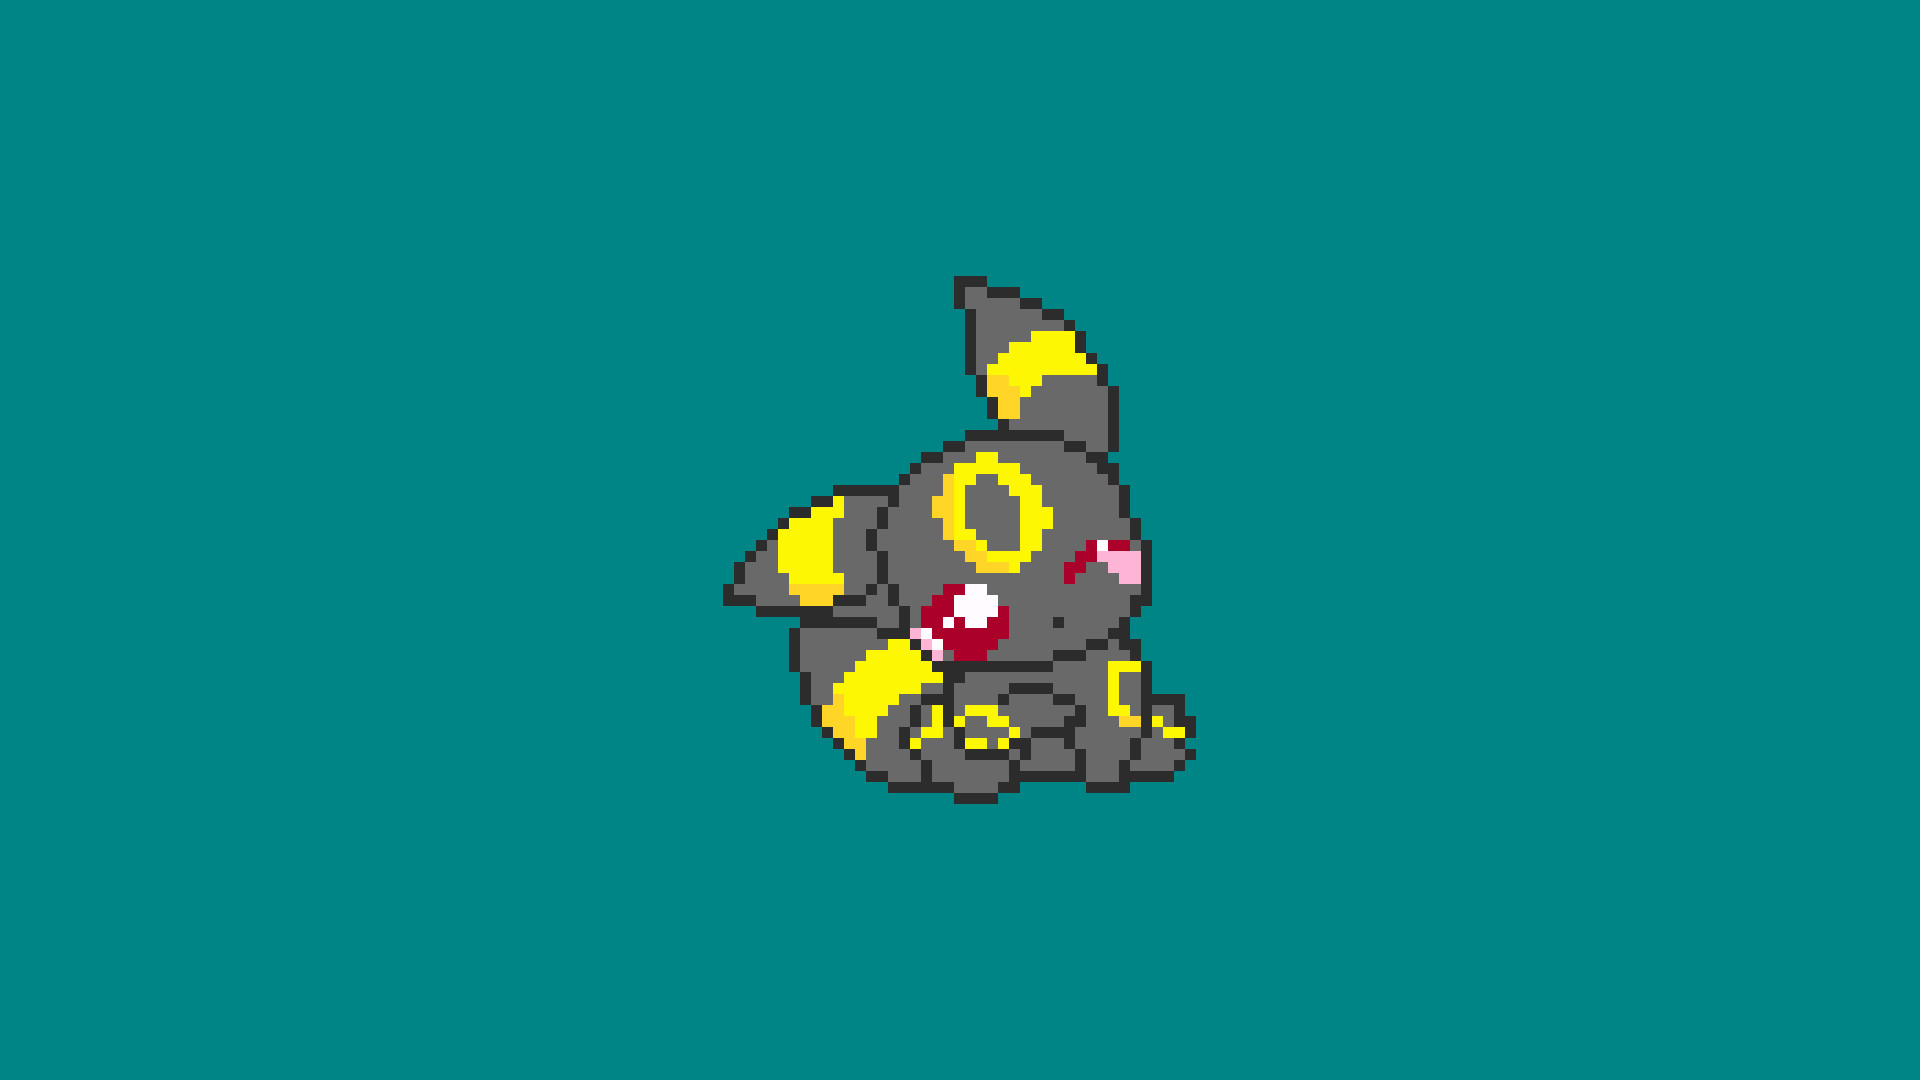 Pokémon, Umbreon, Pixel art, Pixels Wallpaper HD